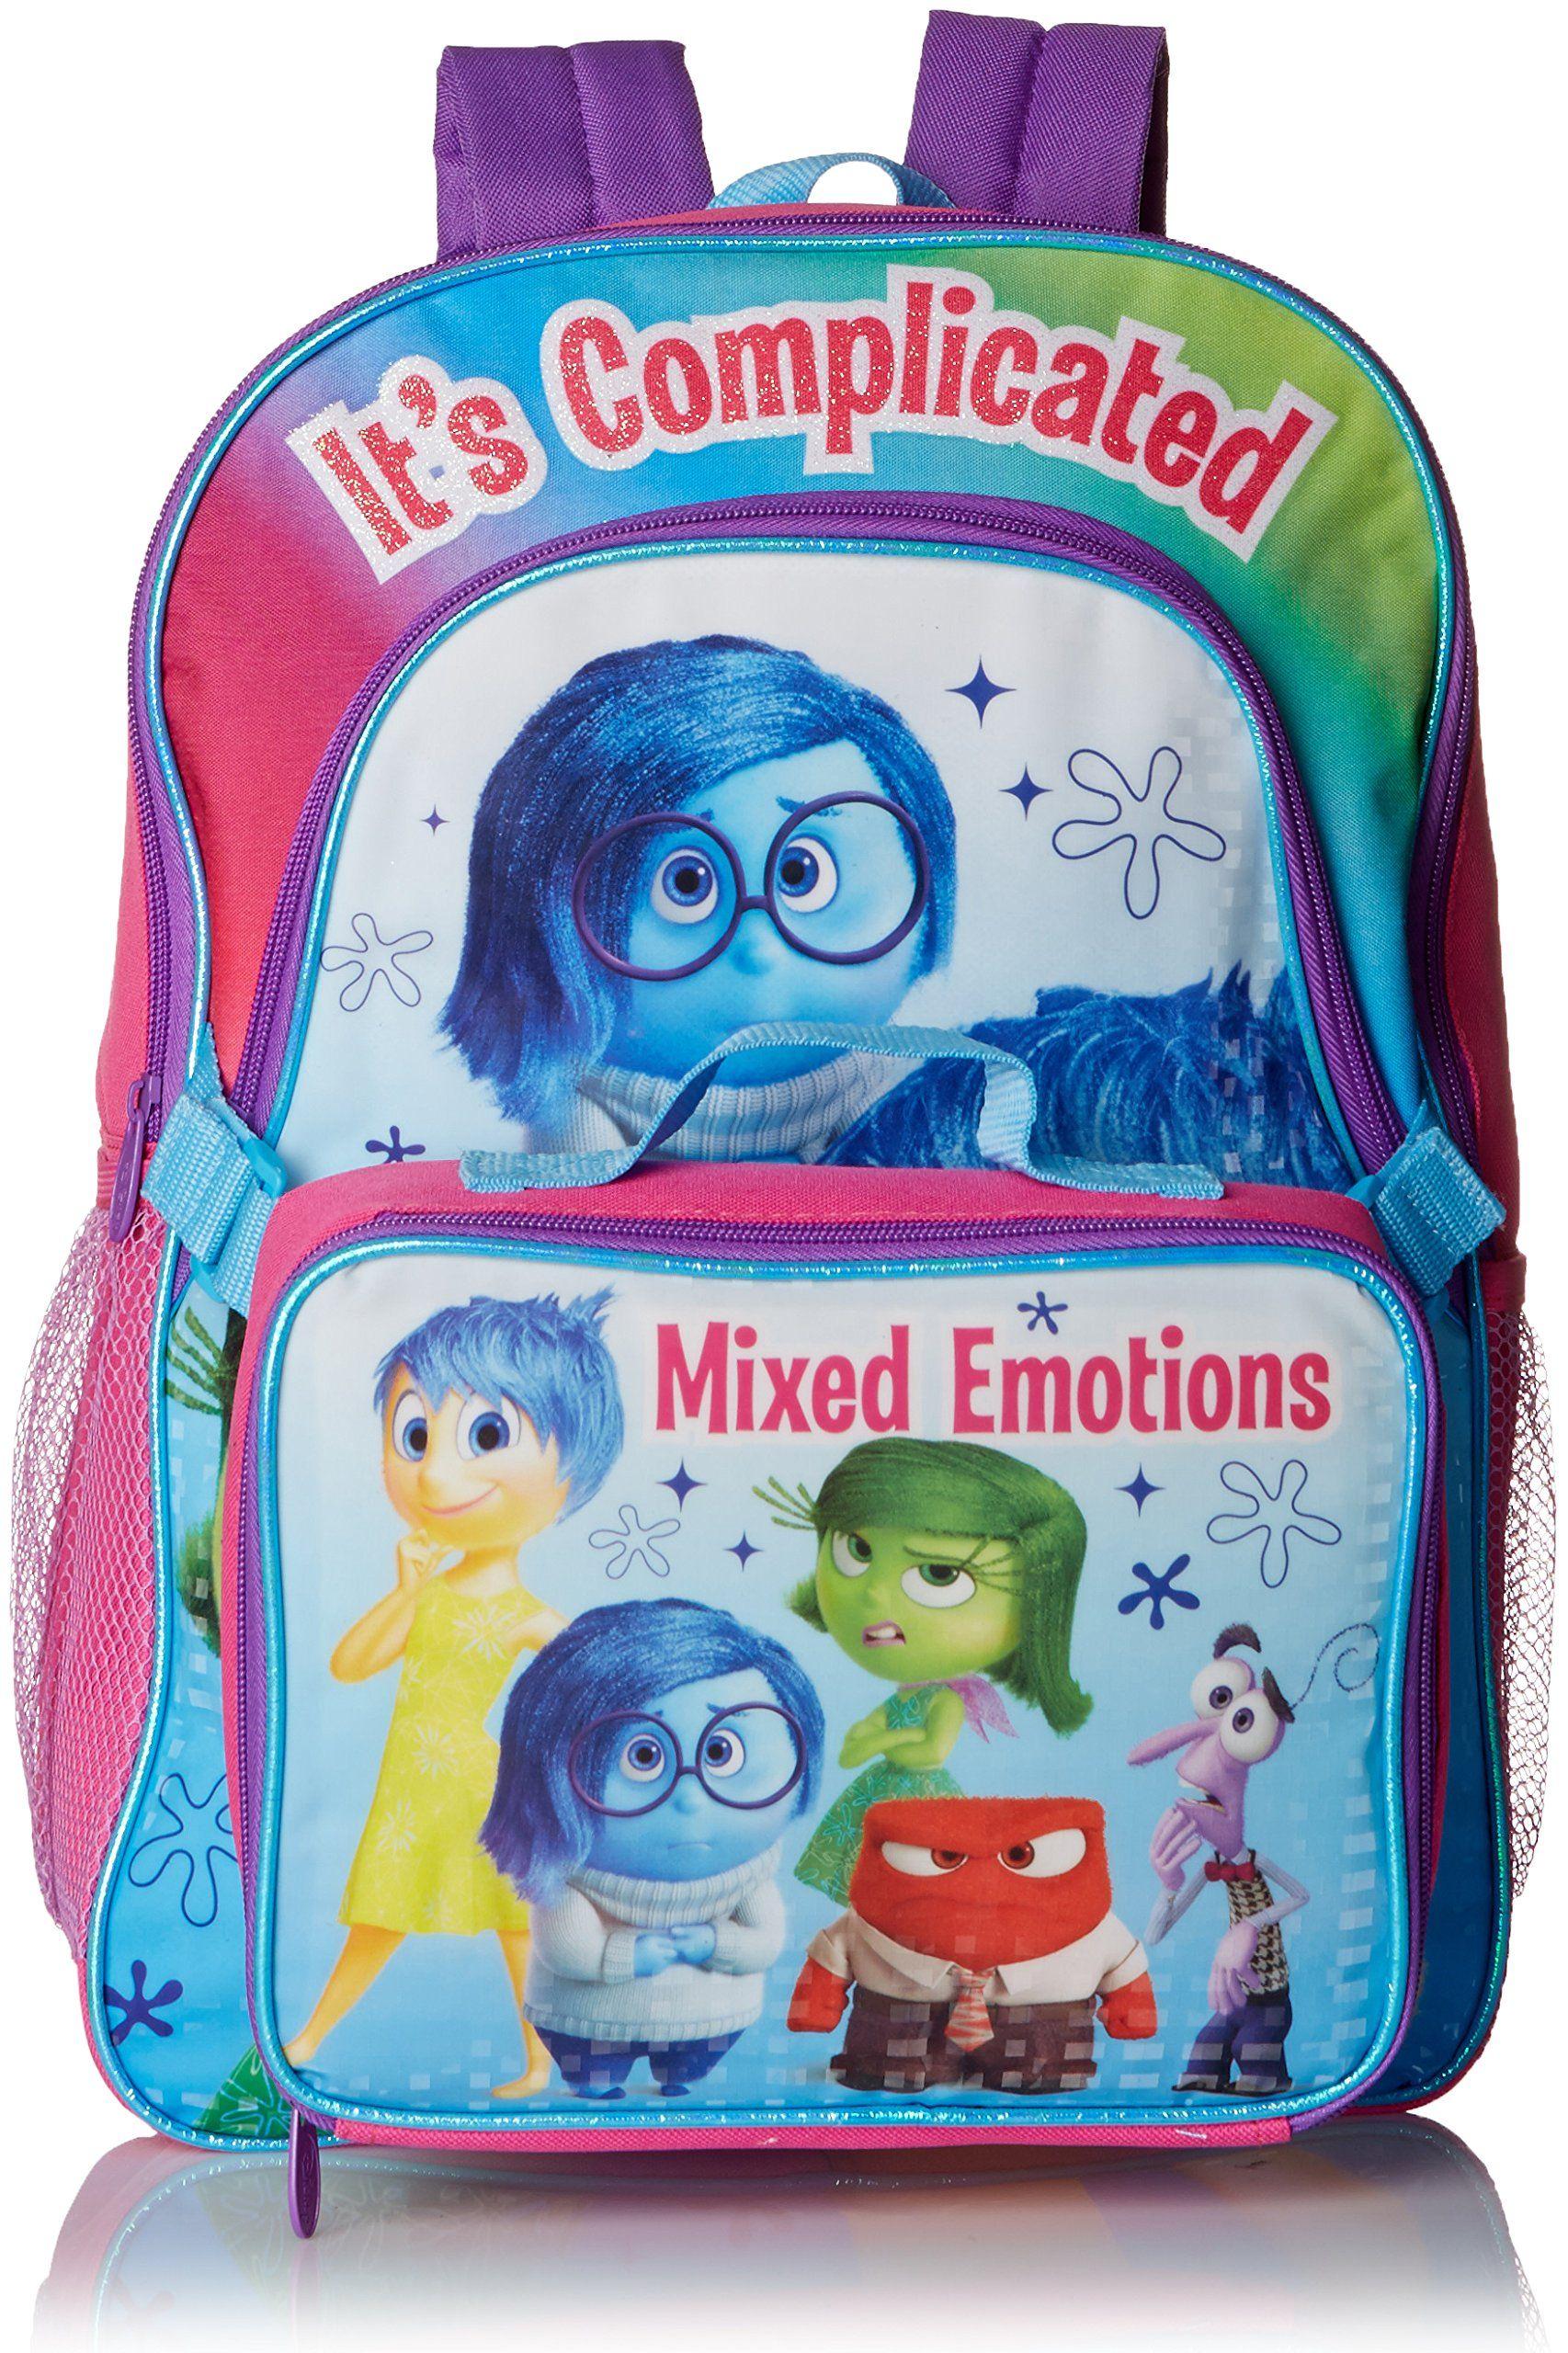 INSIDE OUT Apparel for Kids - T-shirts, Backpacks, Socks & More ...